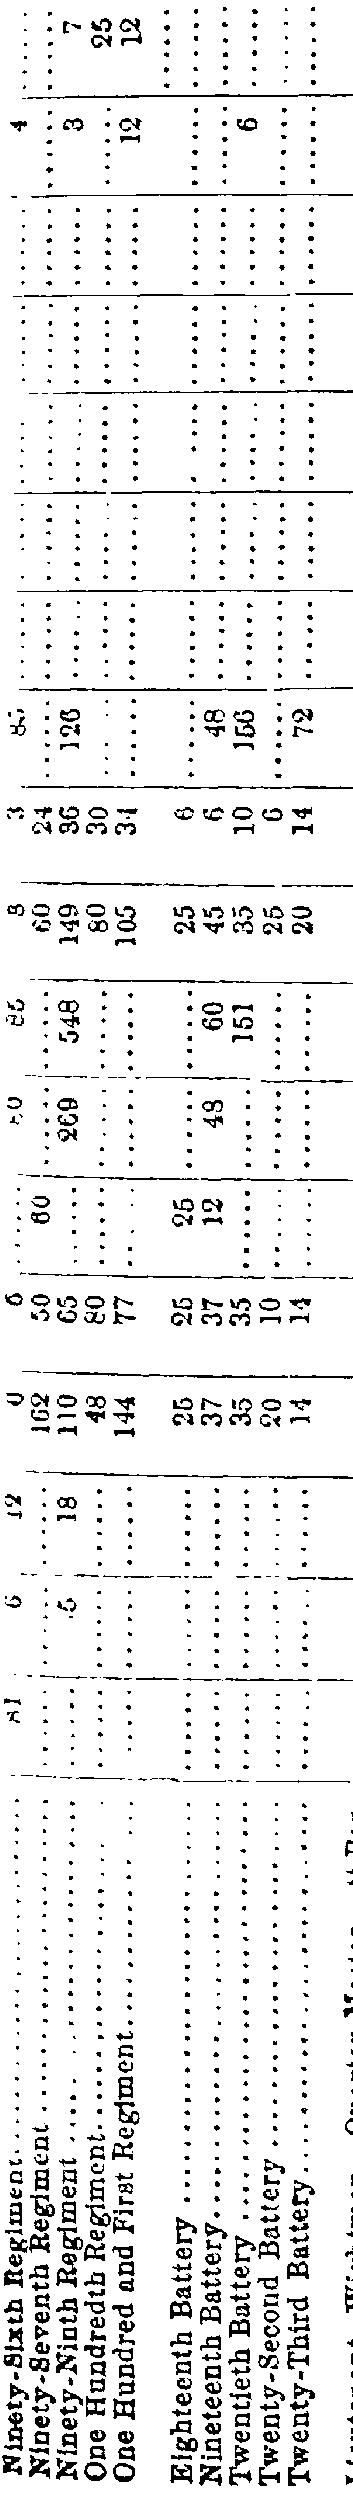 [ocr errors][merged small][ocr errors][ocr errors][merged small][merged small][merged small][merged small][merged small][merged small][merged small][merged small][merged small][merged small][merged small][merged small][merged small][ocr errors][ocr errors][merged small][merged small][ocr errors][merged small][merged small][merged small][merged small][merged small][ocr errors][merged small][merged small][merged small][ocr errors]